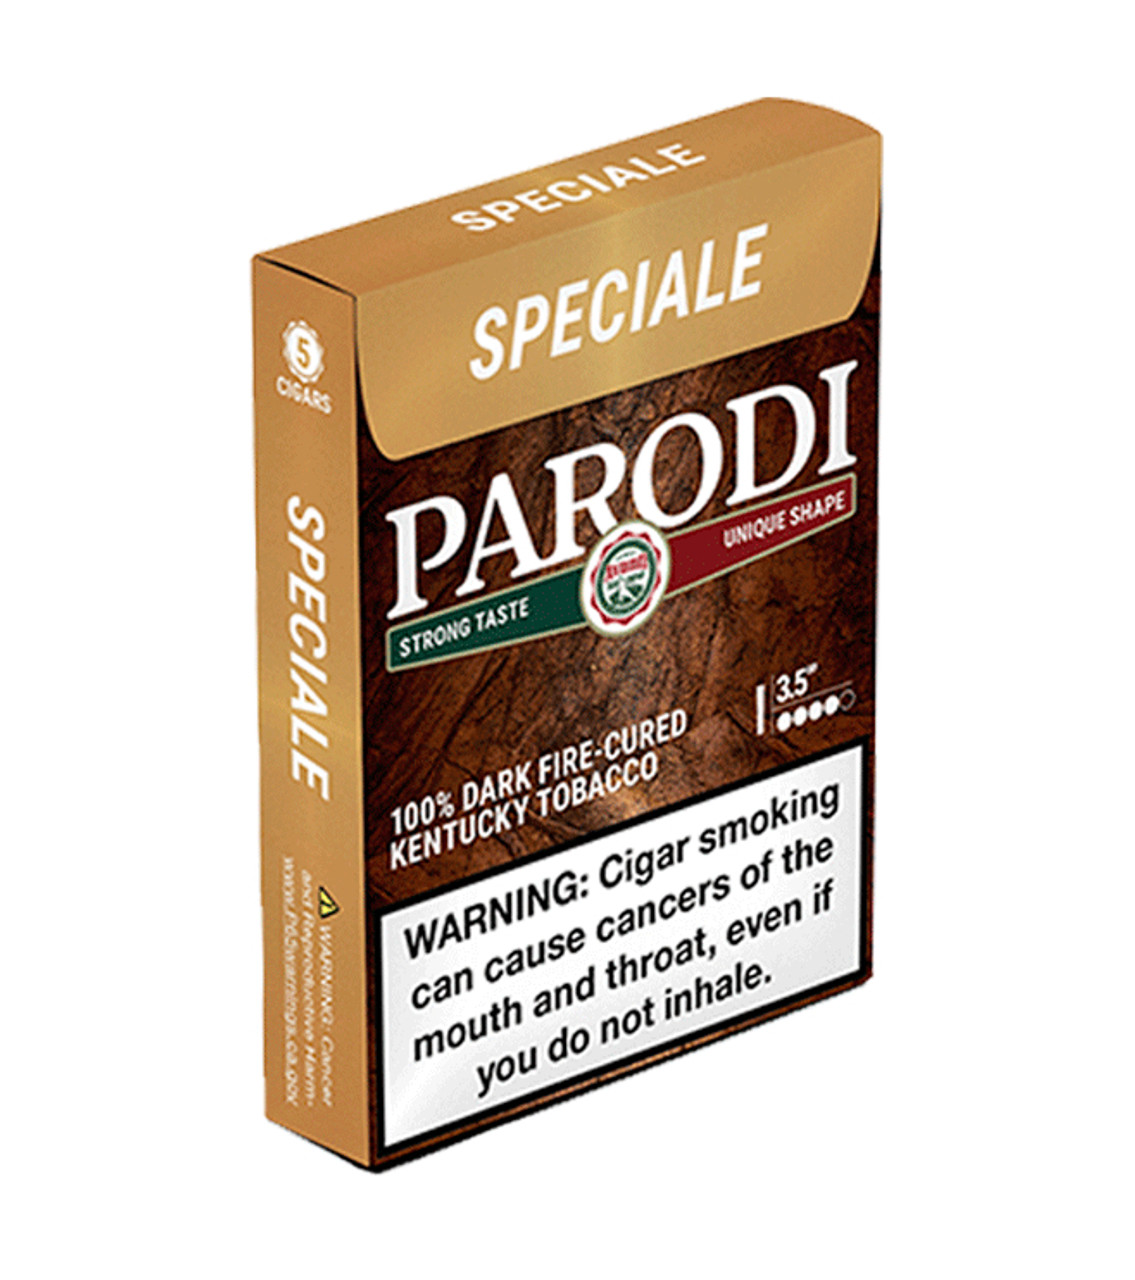 Parodi Speciale Cigars (10 Packs Of 5) - Natural